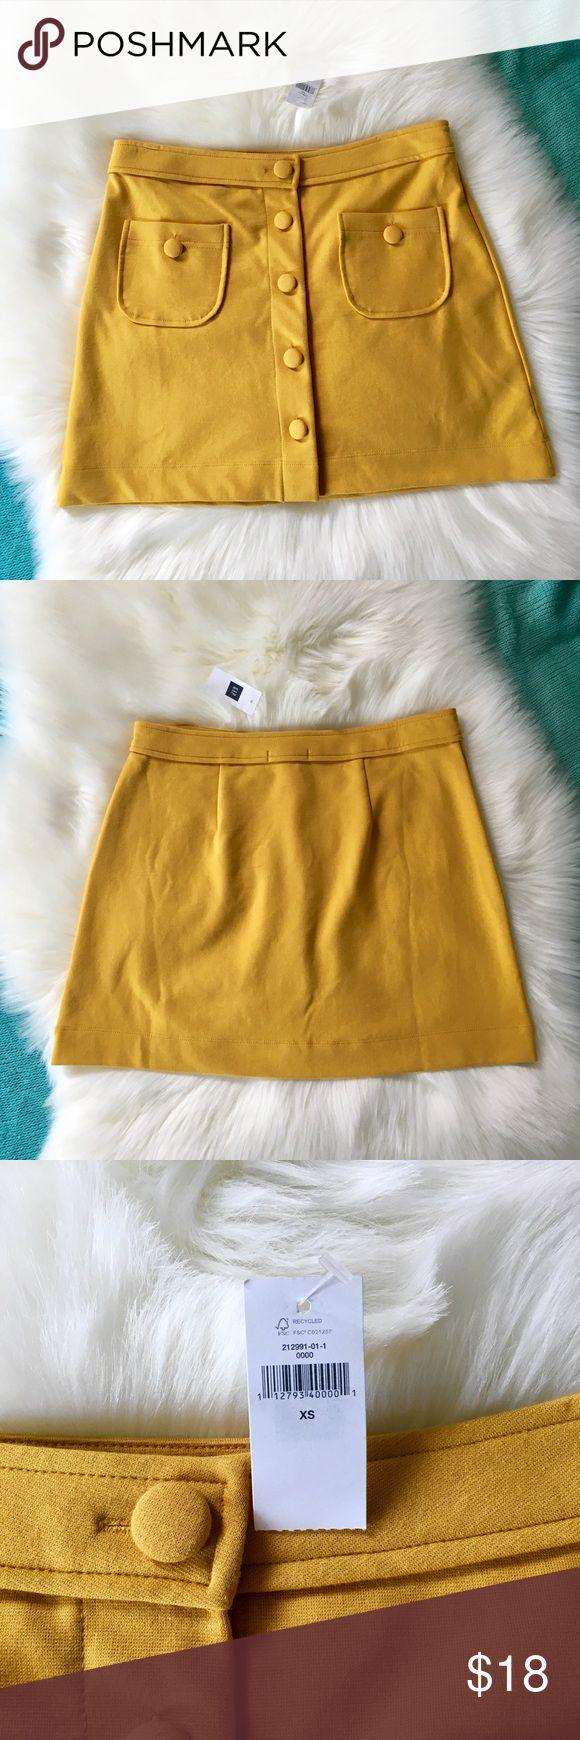 mustard yellow Gap skirt New with tags! XS Gap skirt. So cute! GAP Skirts